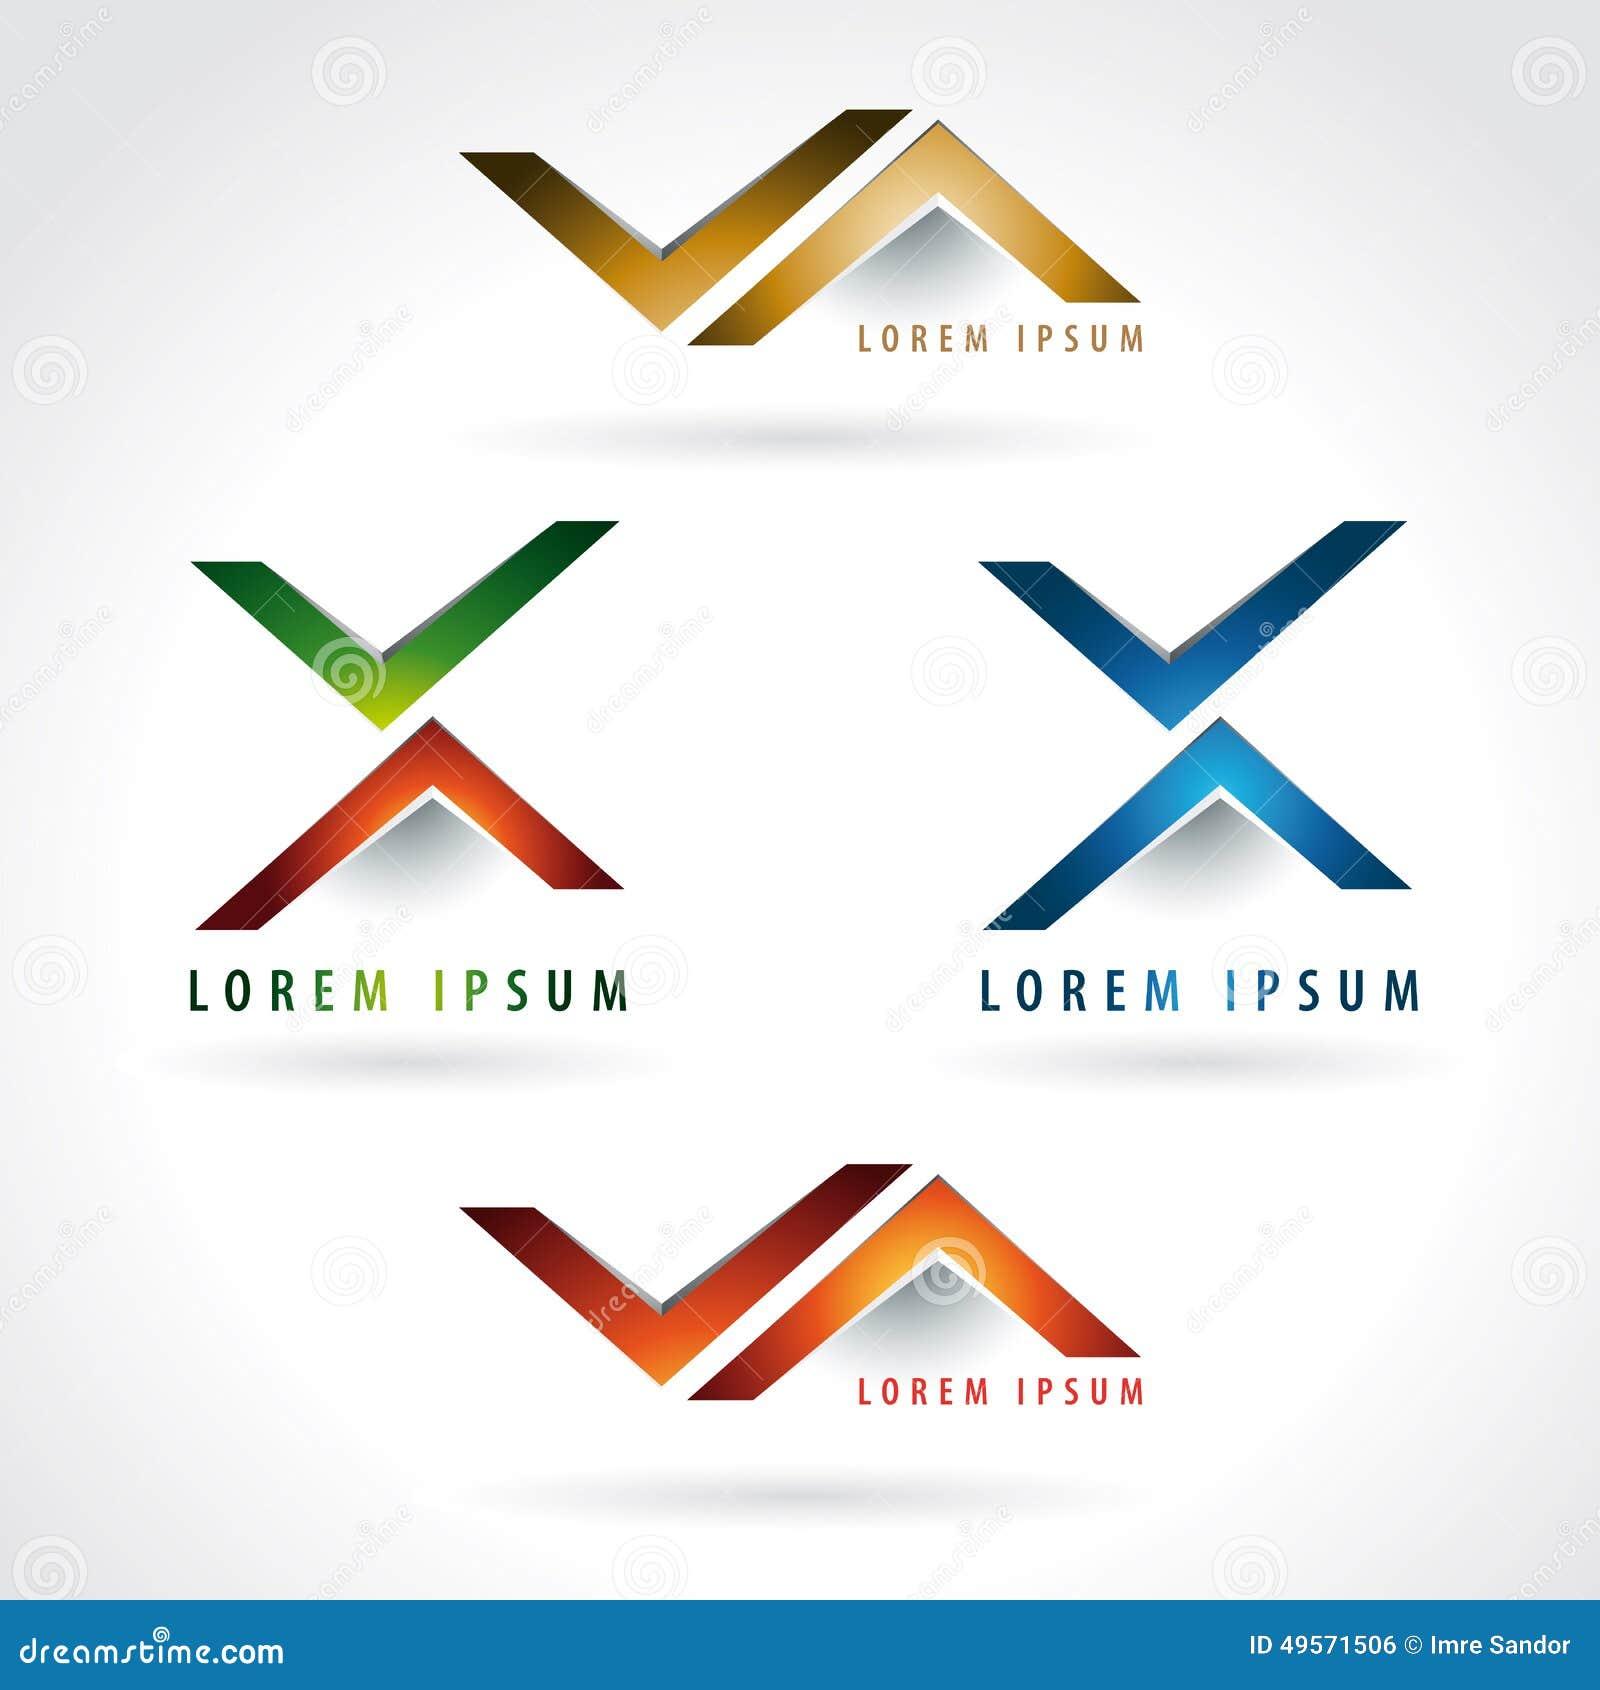 Classroom Design Arrow Or X ~ Letter and arrow shape logo stock vector image